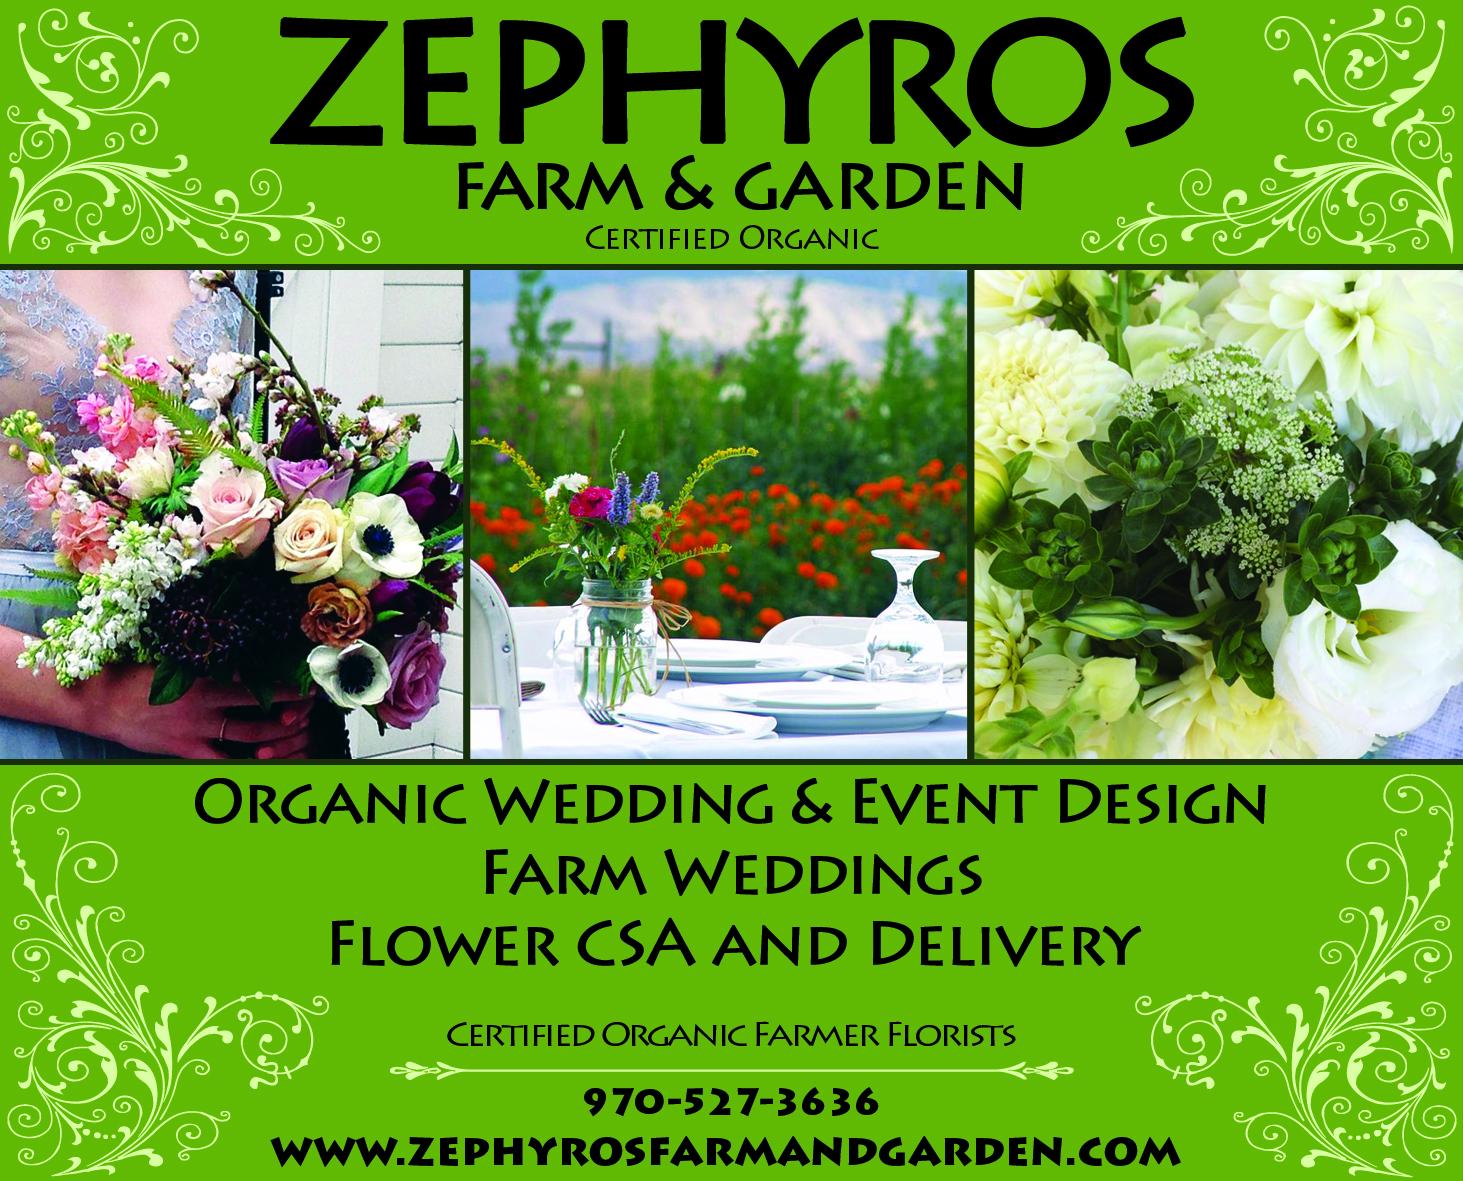 ZEPHYROS Farm